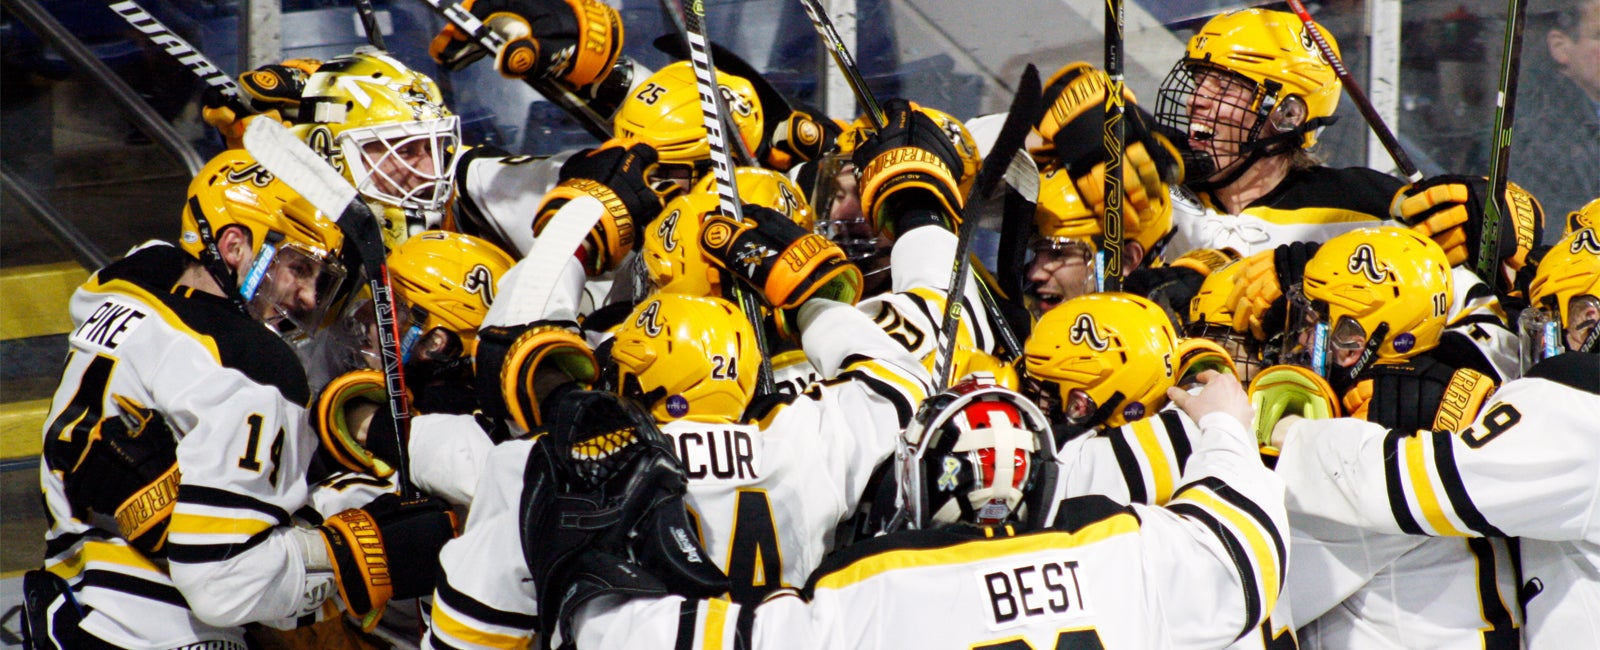 AIC Men's Hockey vs. Quinnipiac University